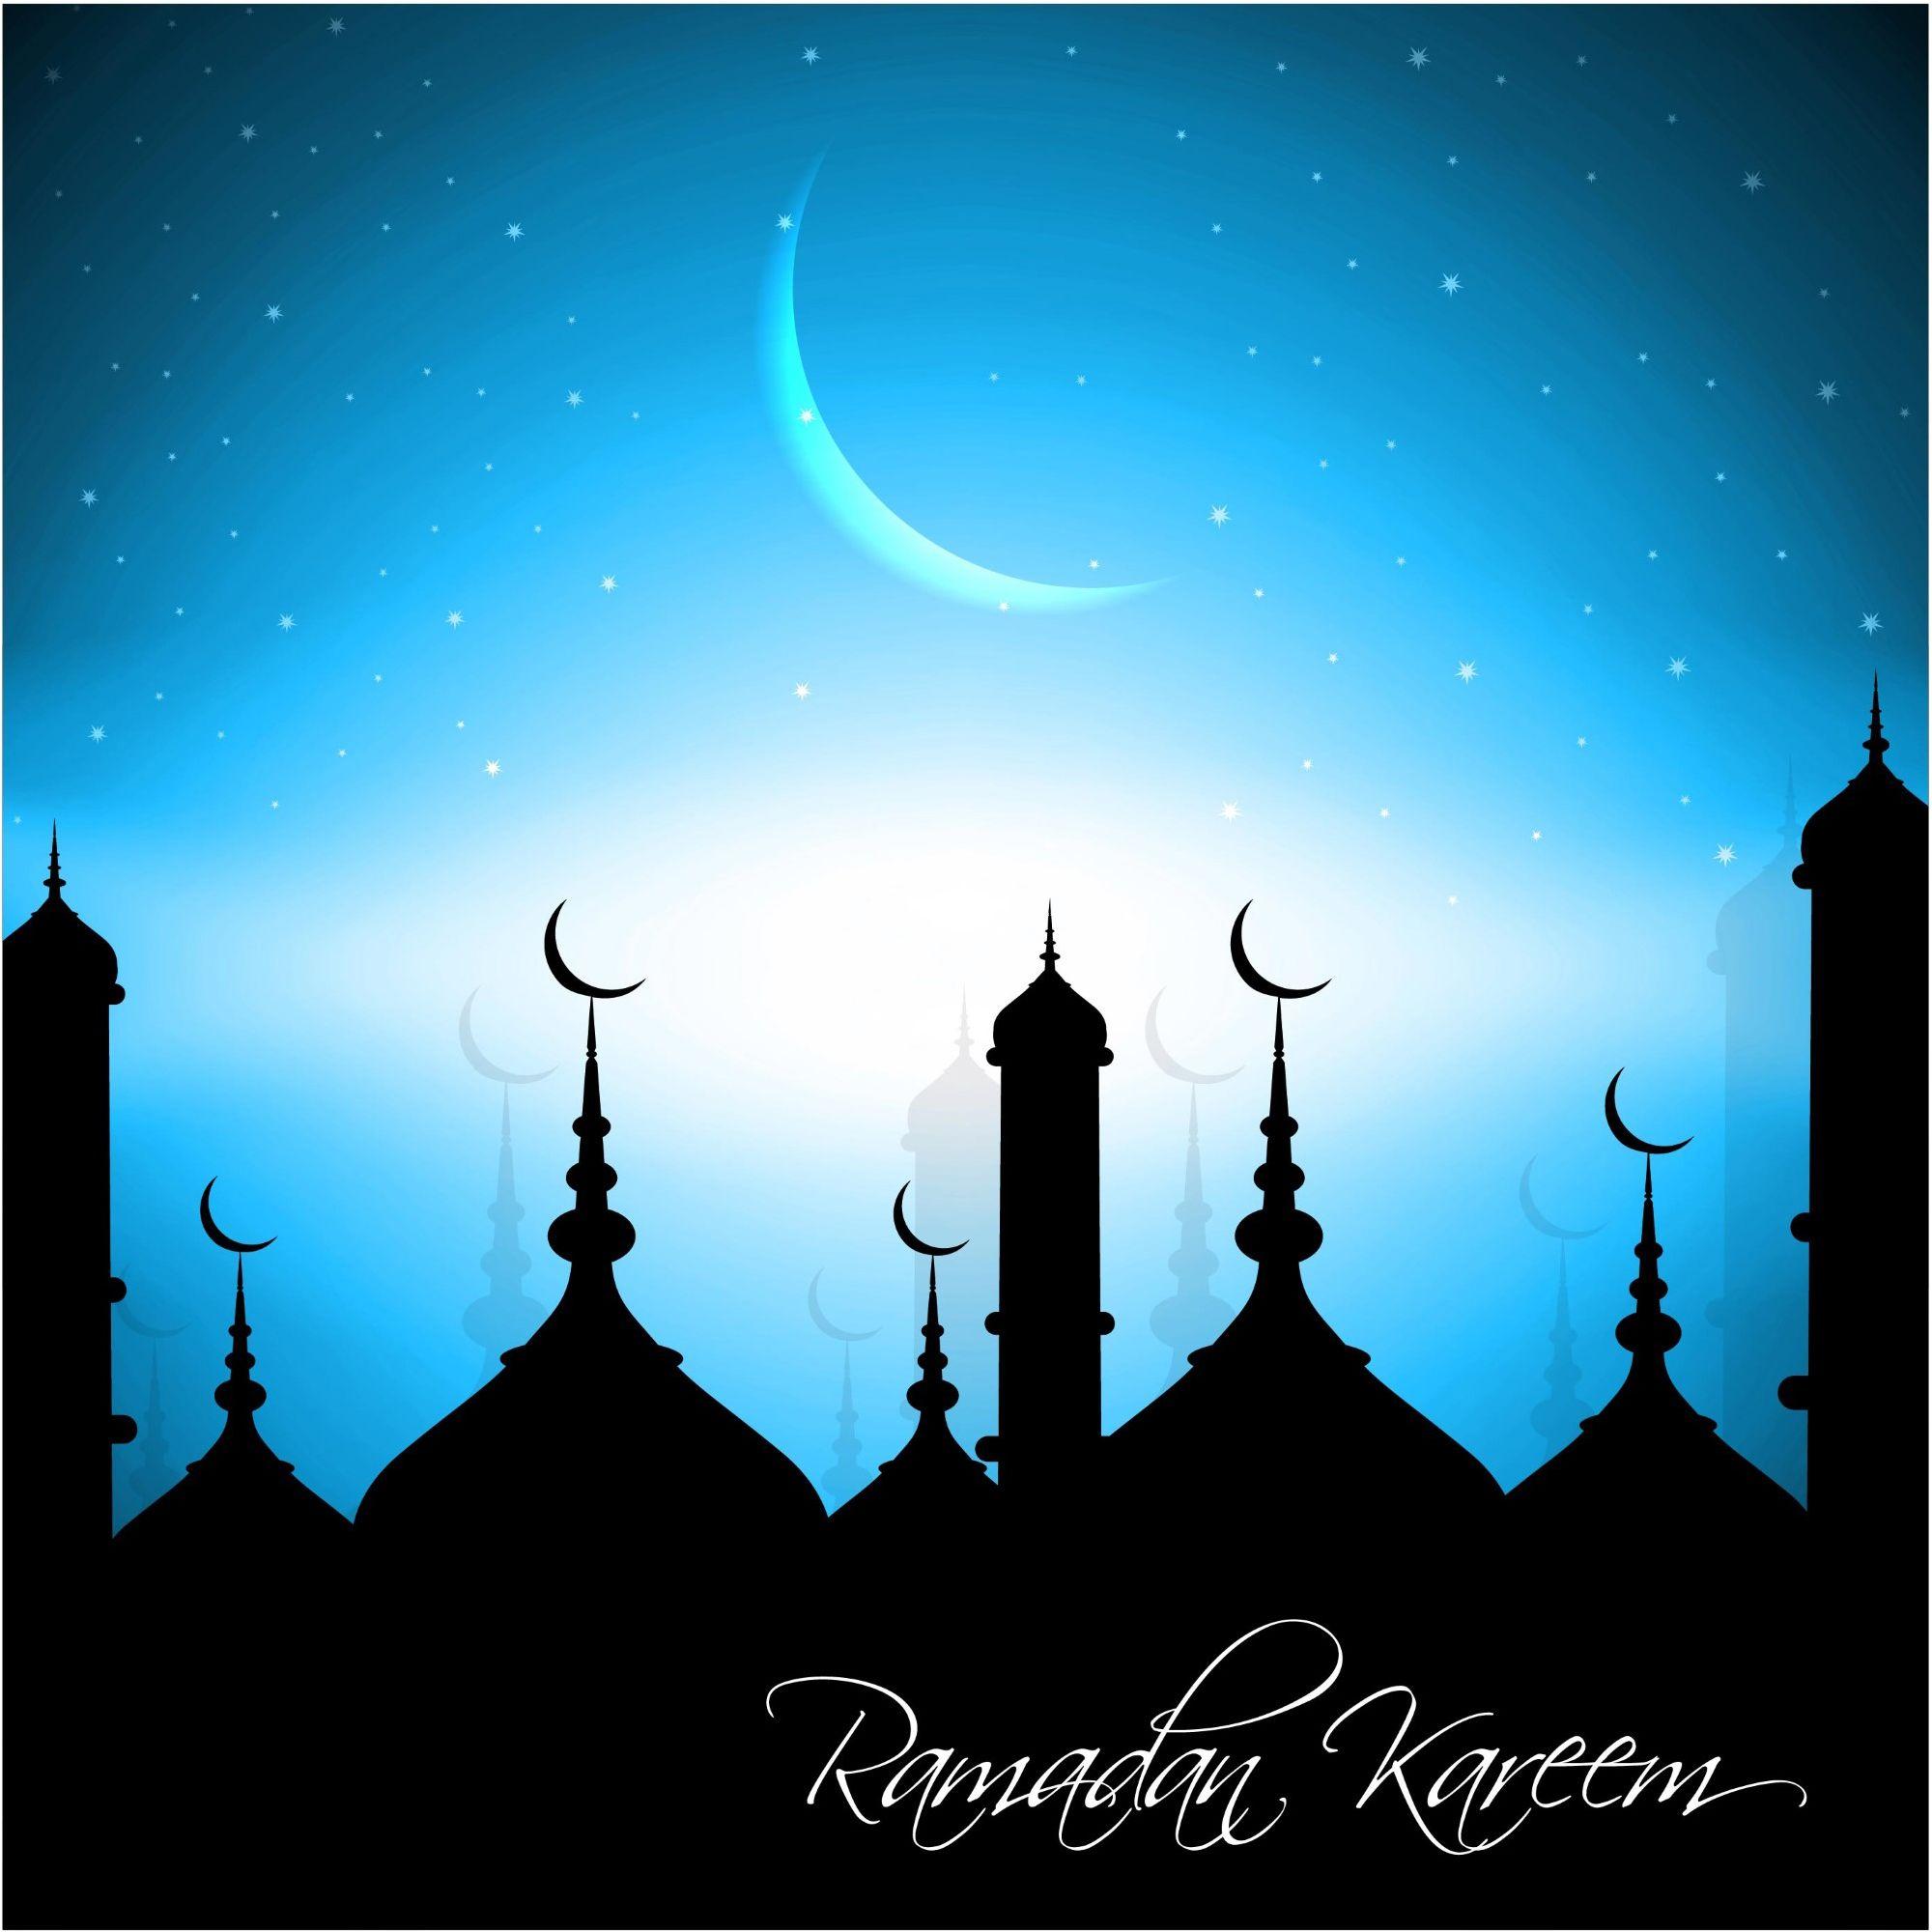 Cool Cold Design Ramadan Kareem Blue Background Image